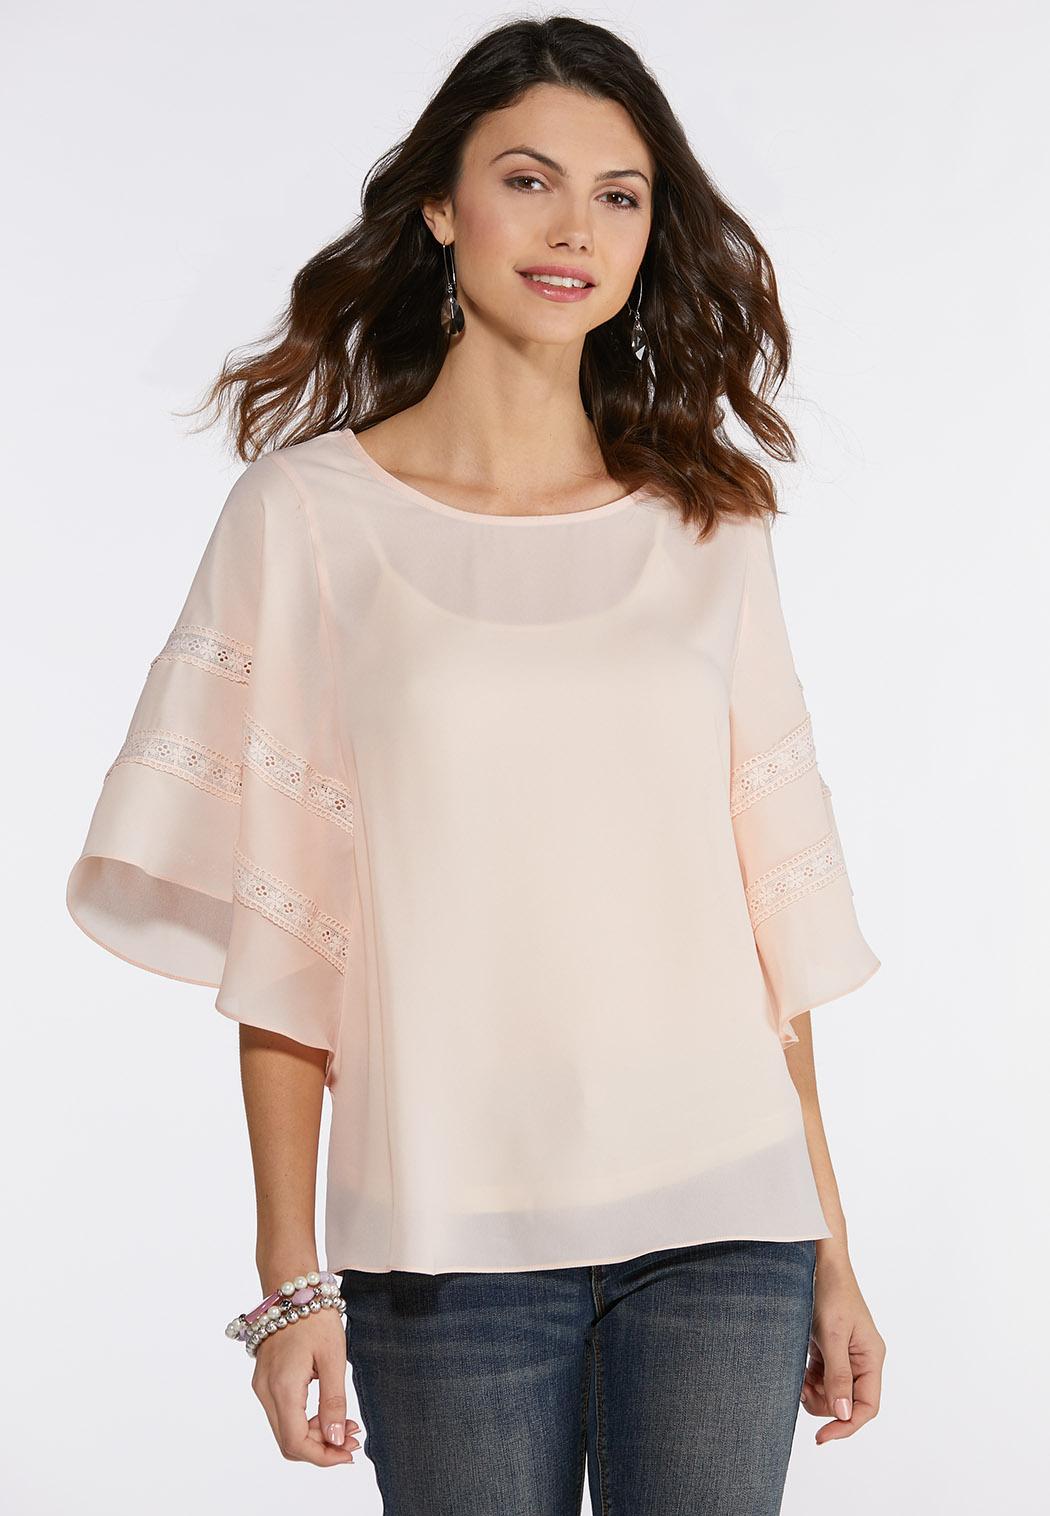 8dbf1d0367b4c2 Plus Size Blush Lace Trim Top Shirts & Blouses Cato Fashions